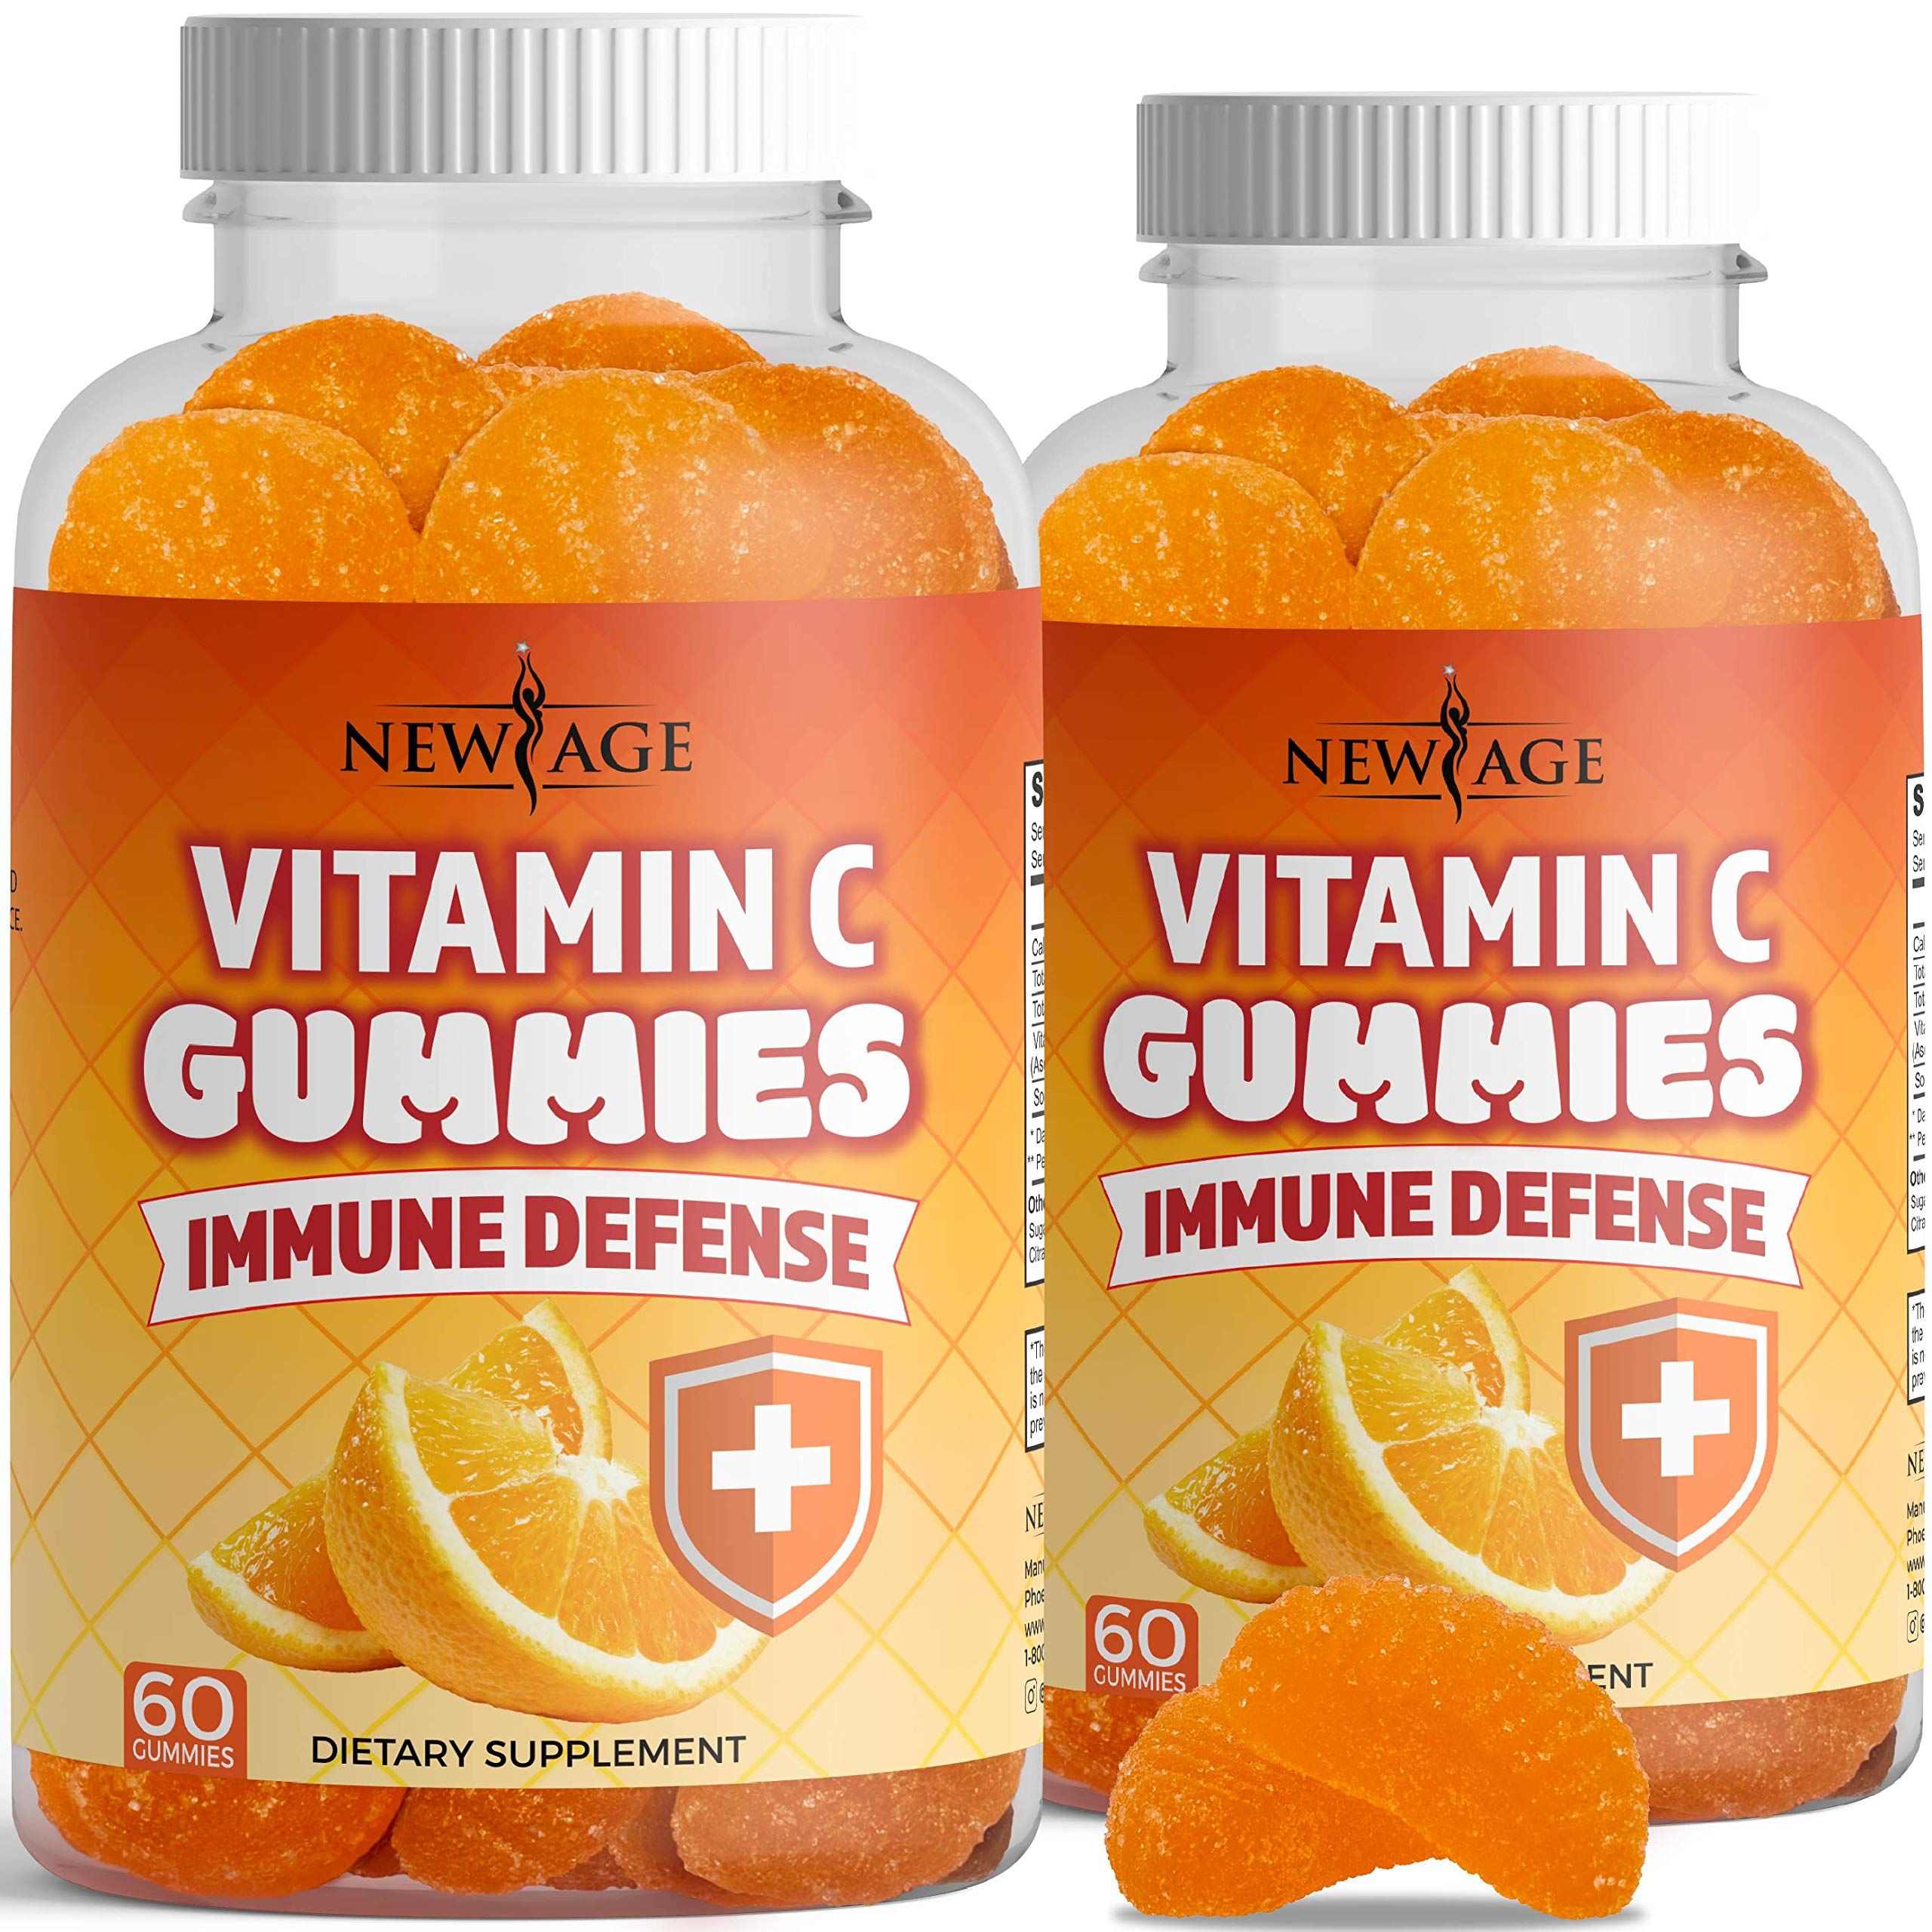 Vitamin C Gummies by New Age - Orange Vitamin C Gummy 2-Pack - Supports Healthy Immune System - Vegetarian Without Gluten - 120 Gummies